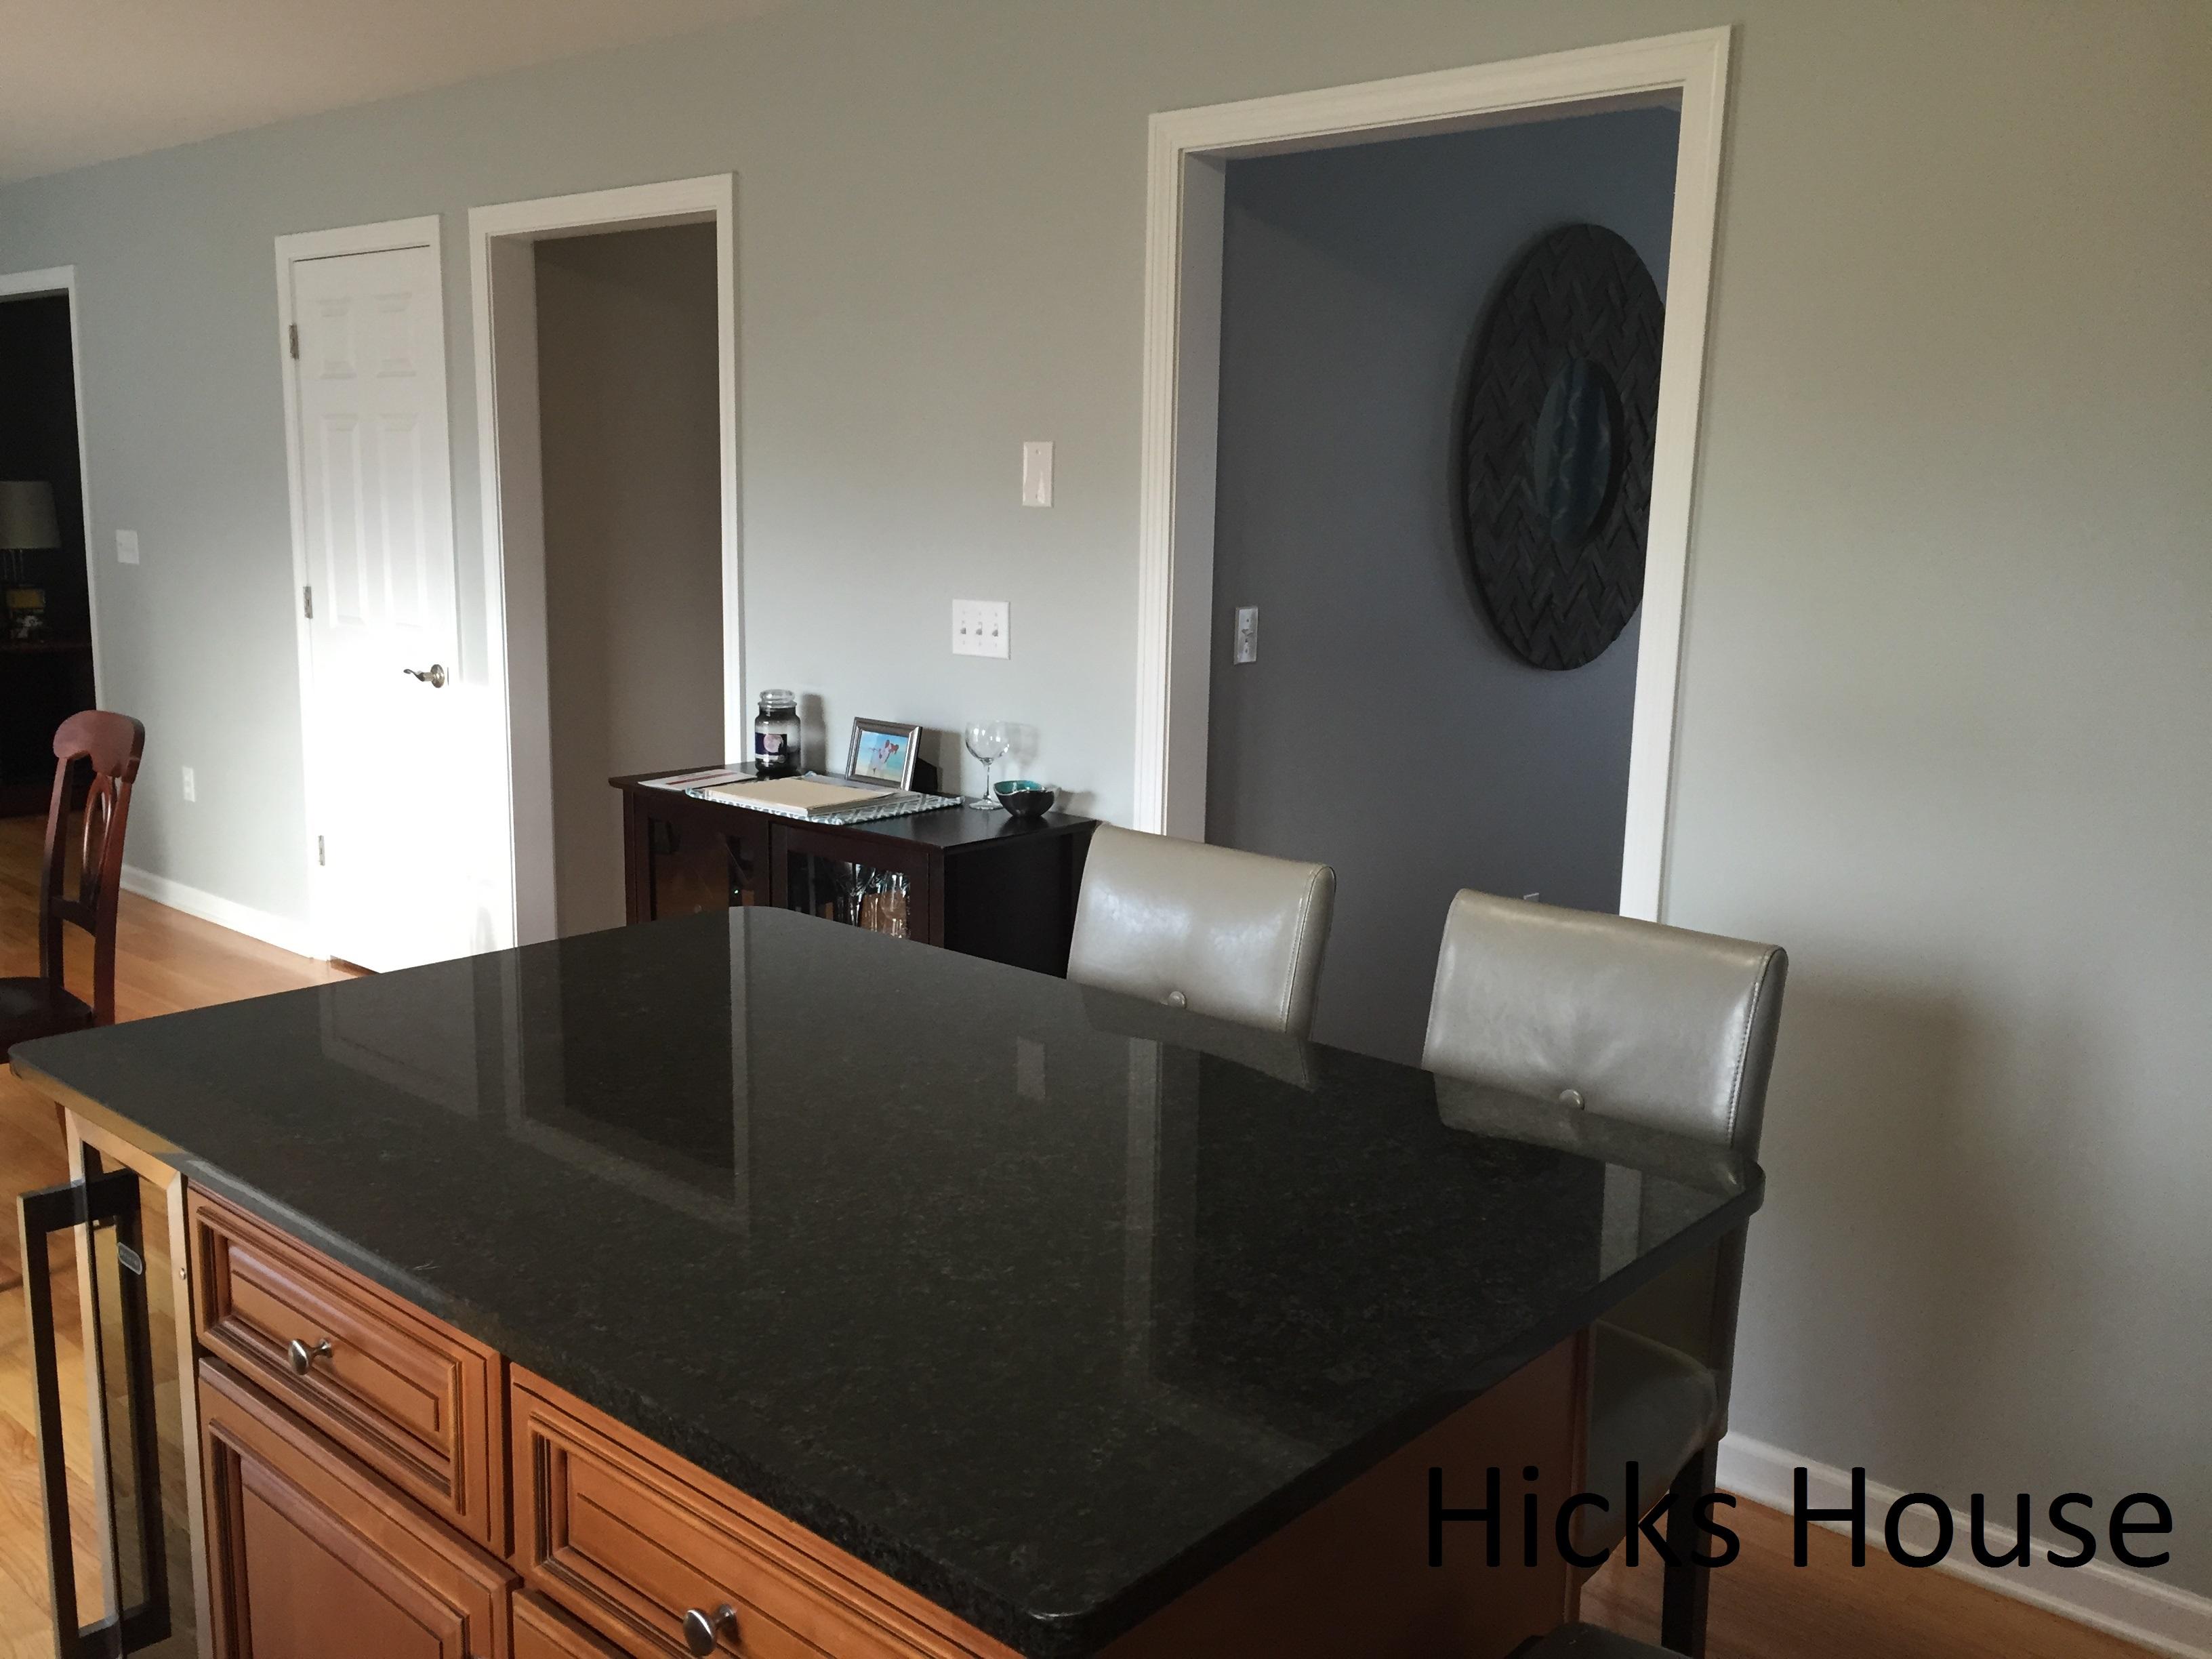 marble kitchen floor kingston brass faucet benjamin moore arctic gray | hicks house